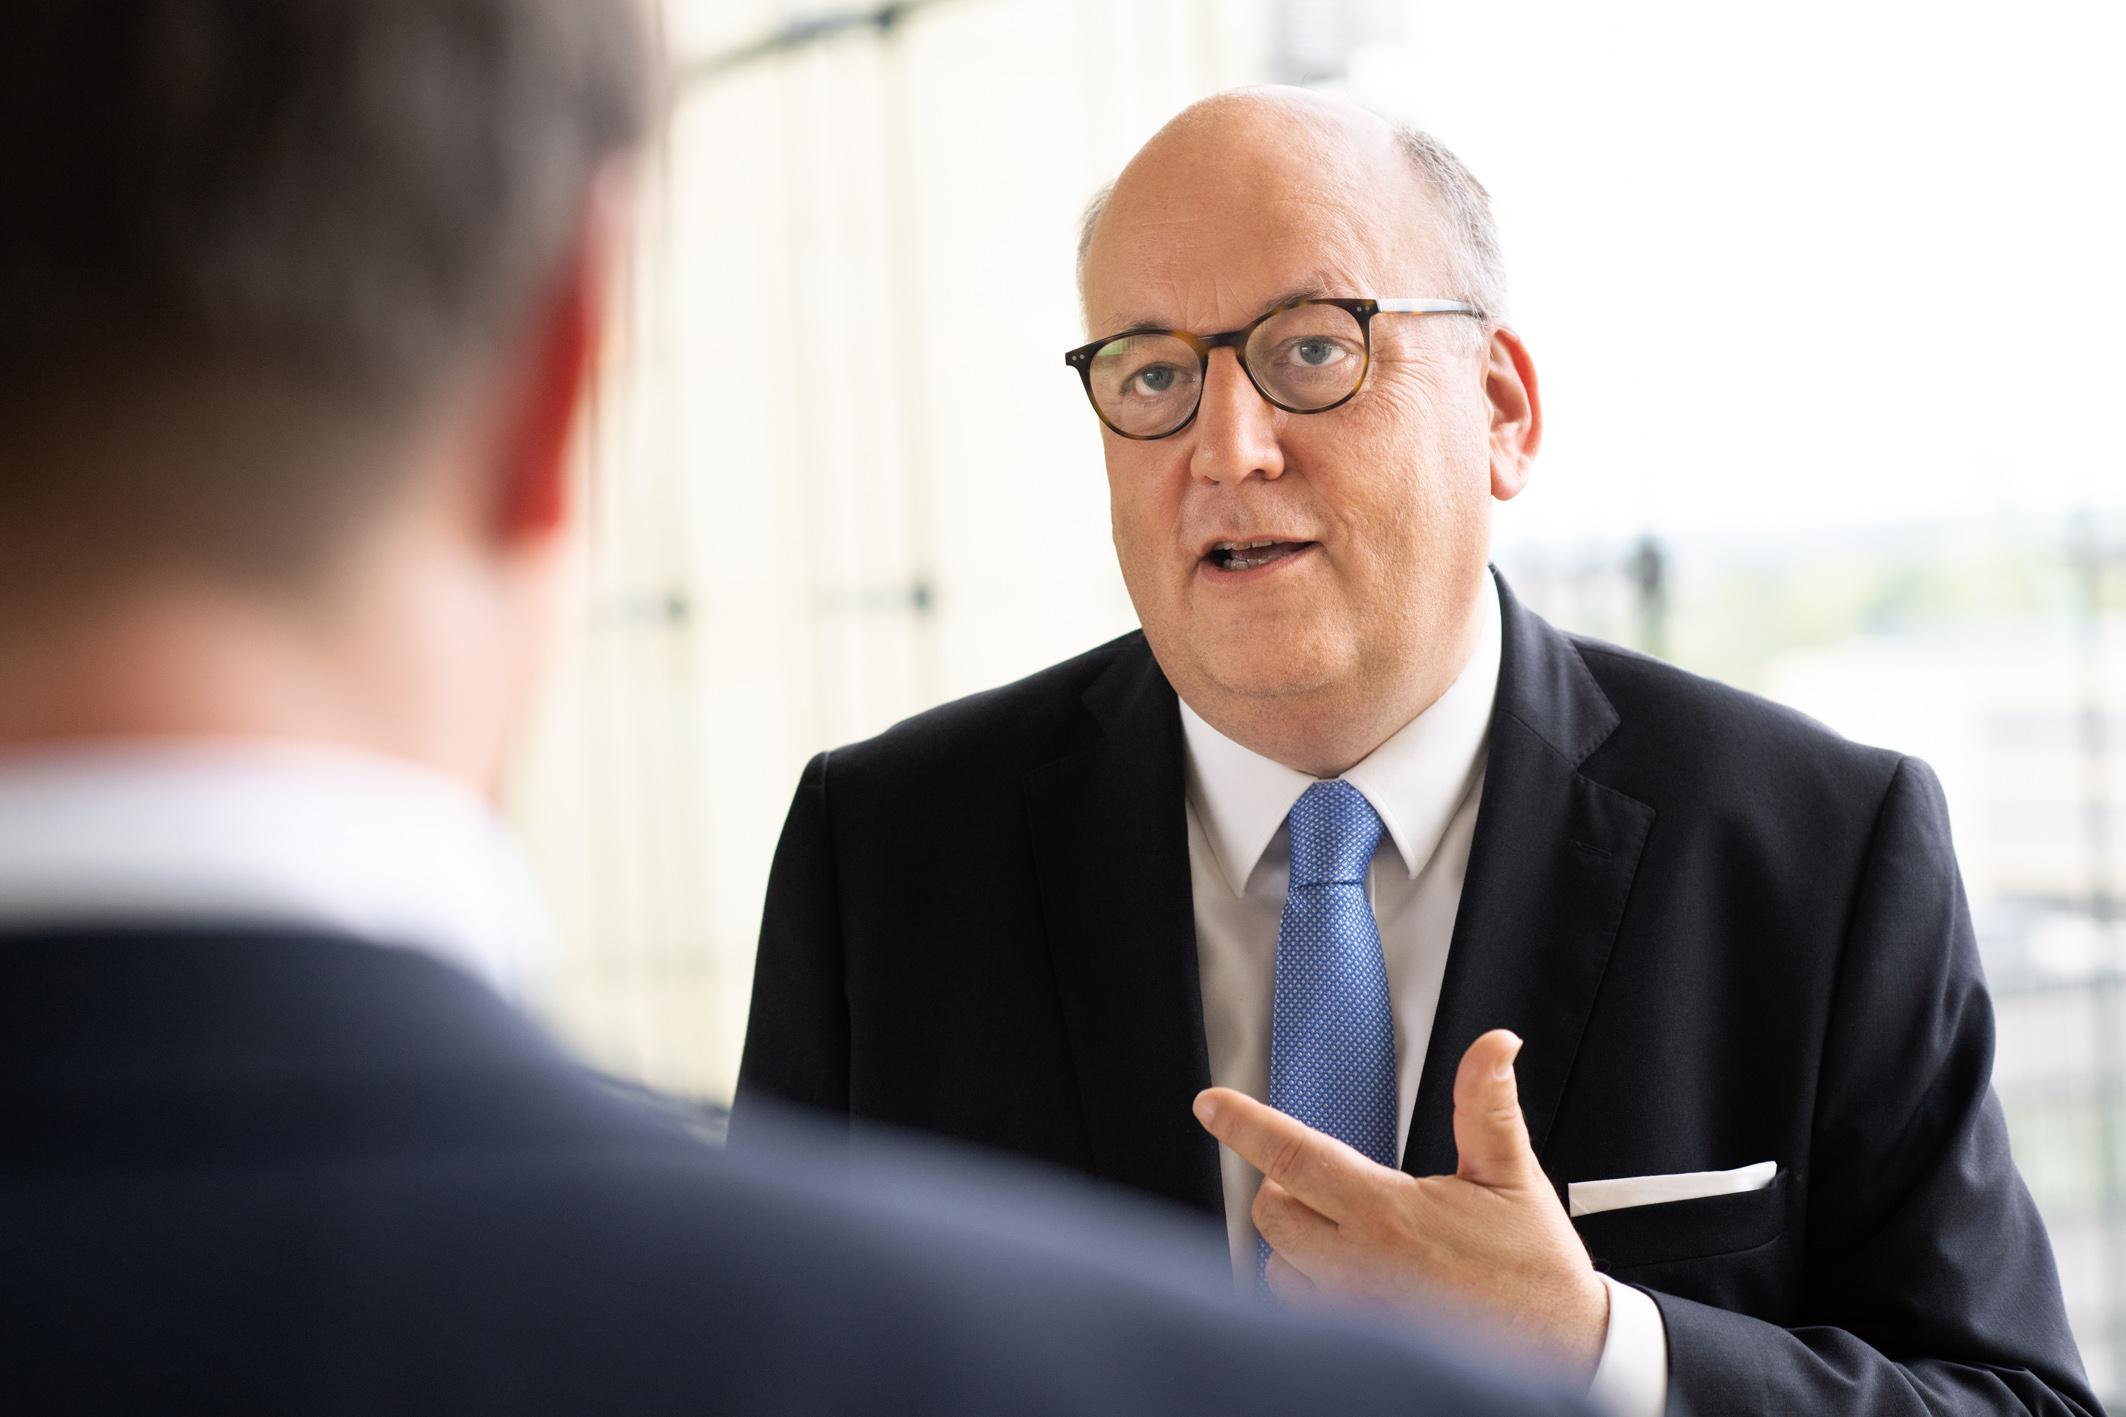 Materials Services Chairman, Martin Stillger